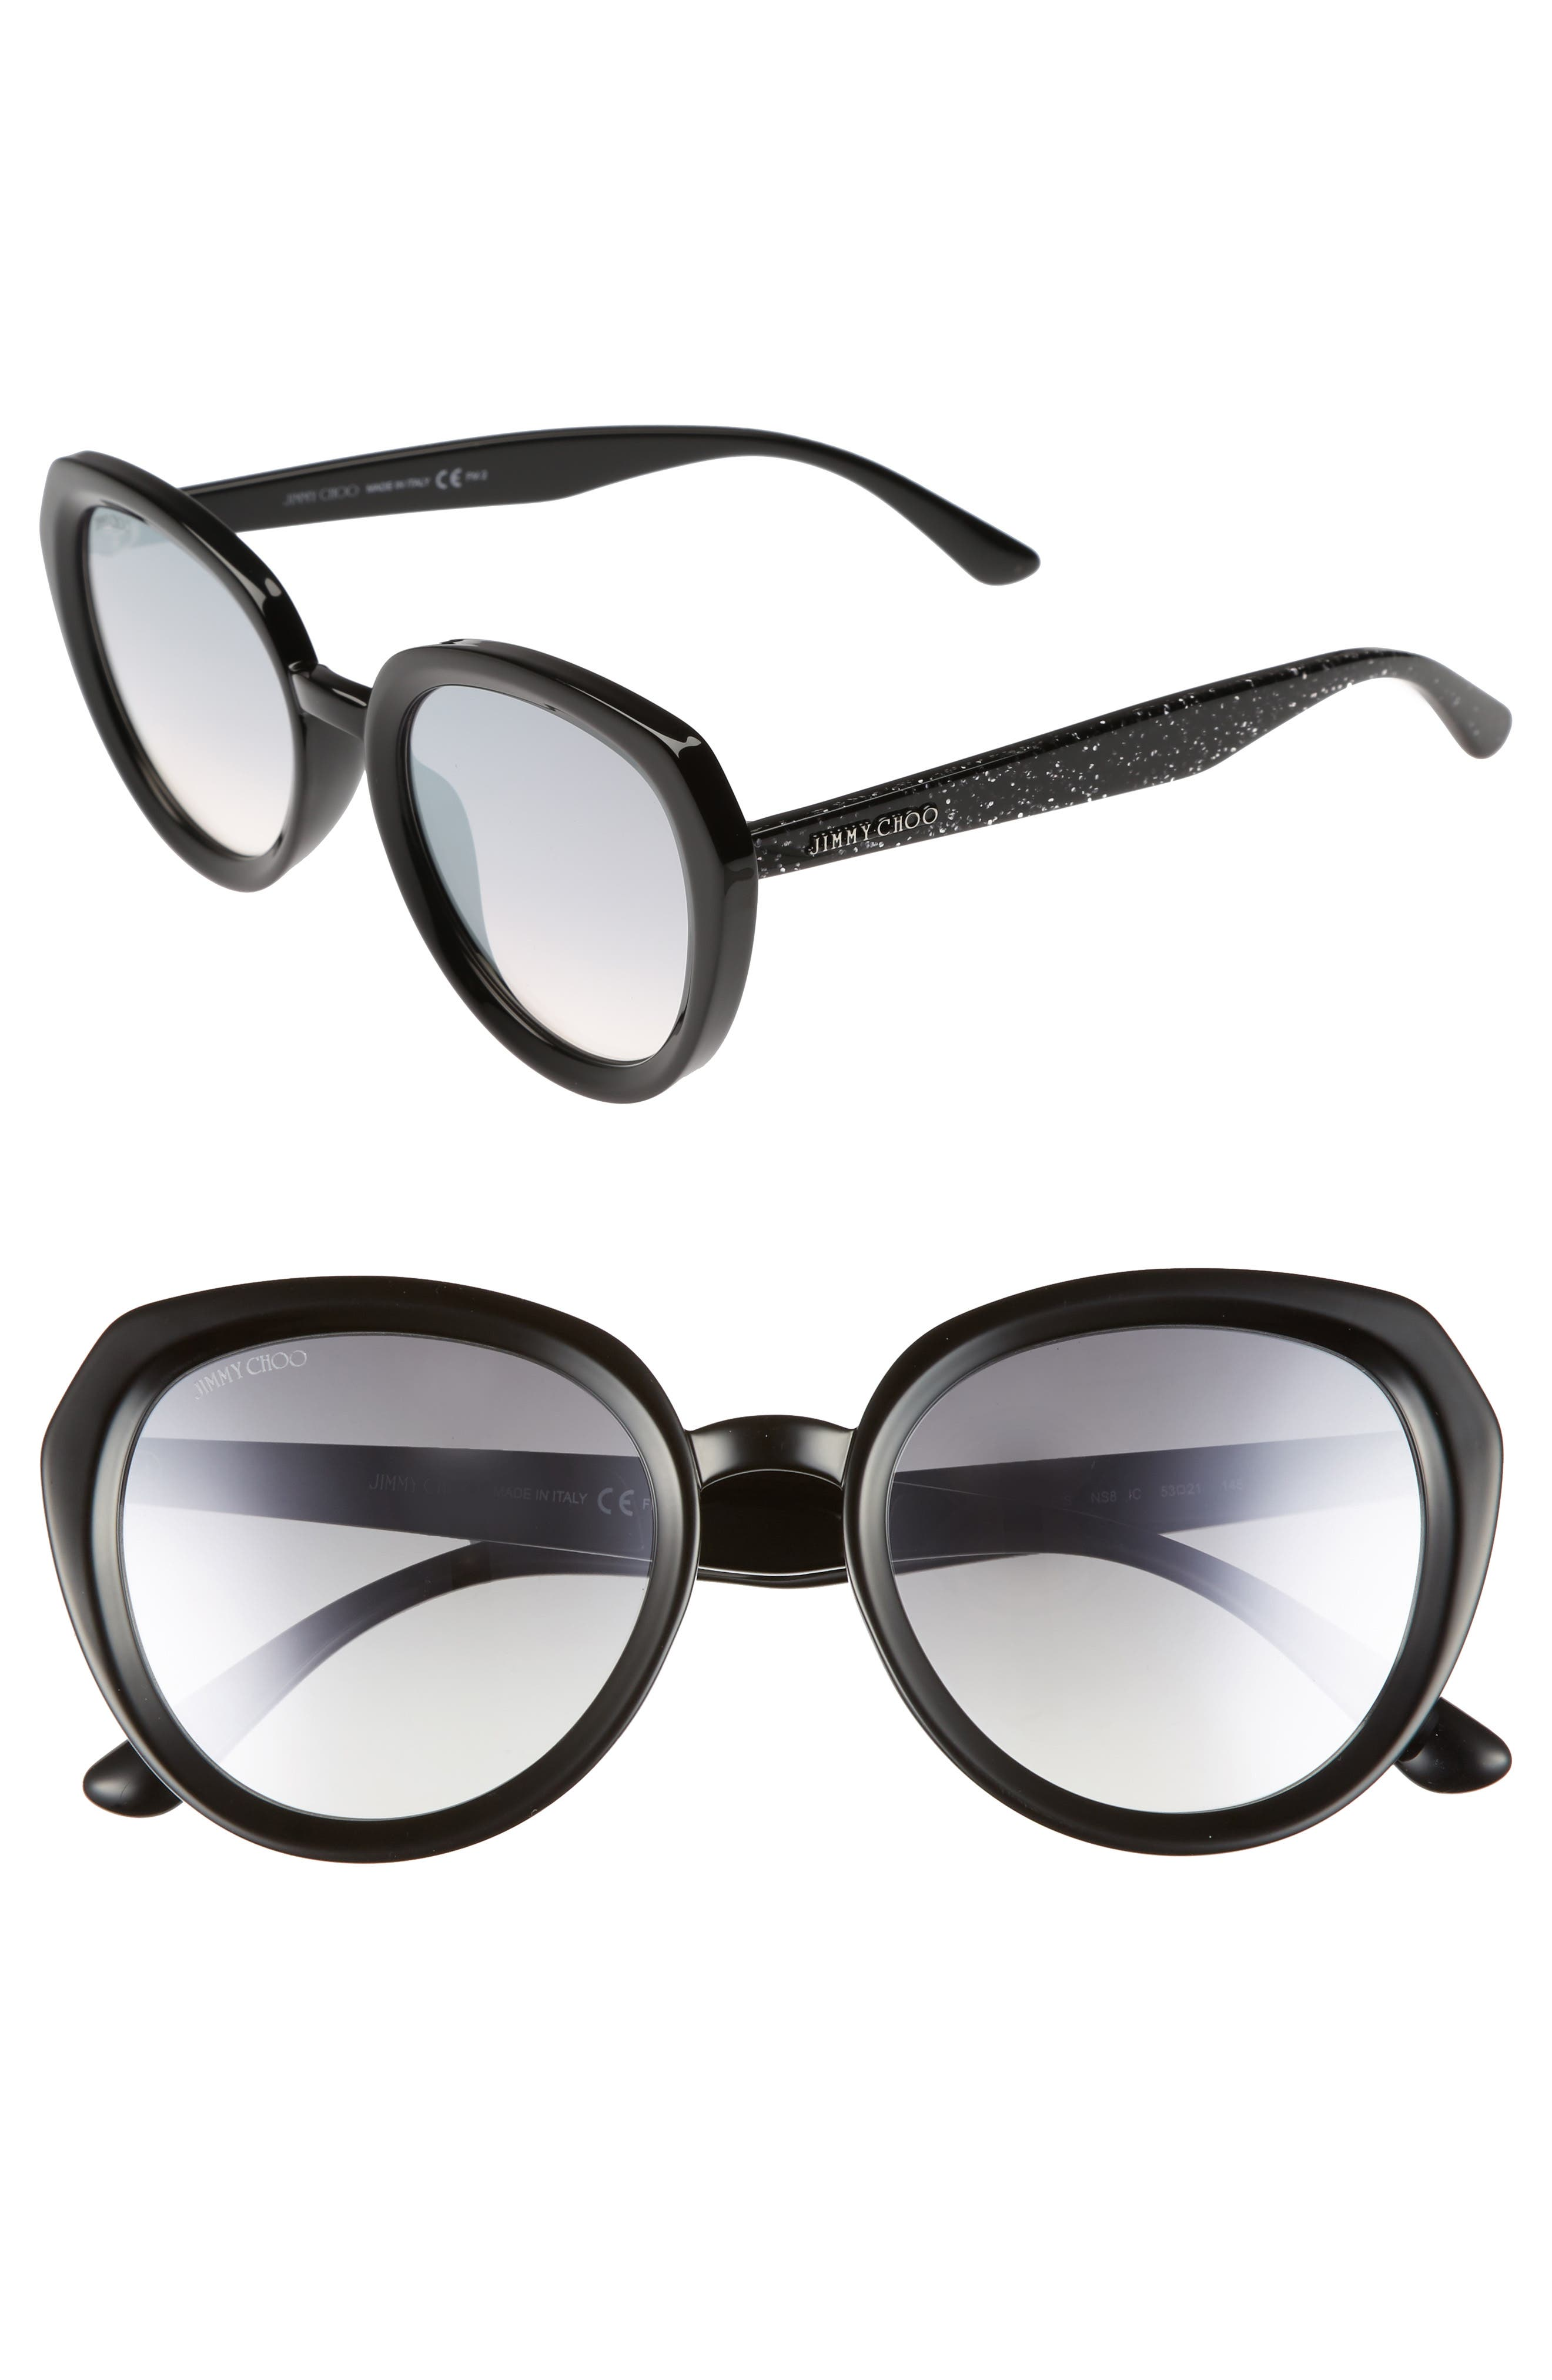 987eaa8d82ef Jimmy Choo Sunglasses for Women